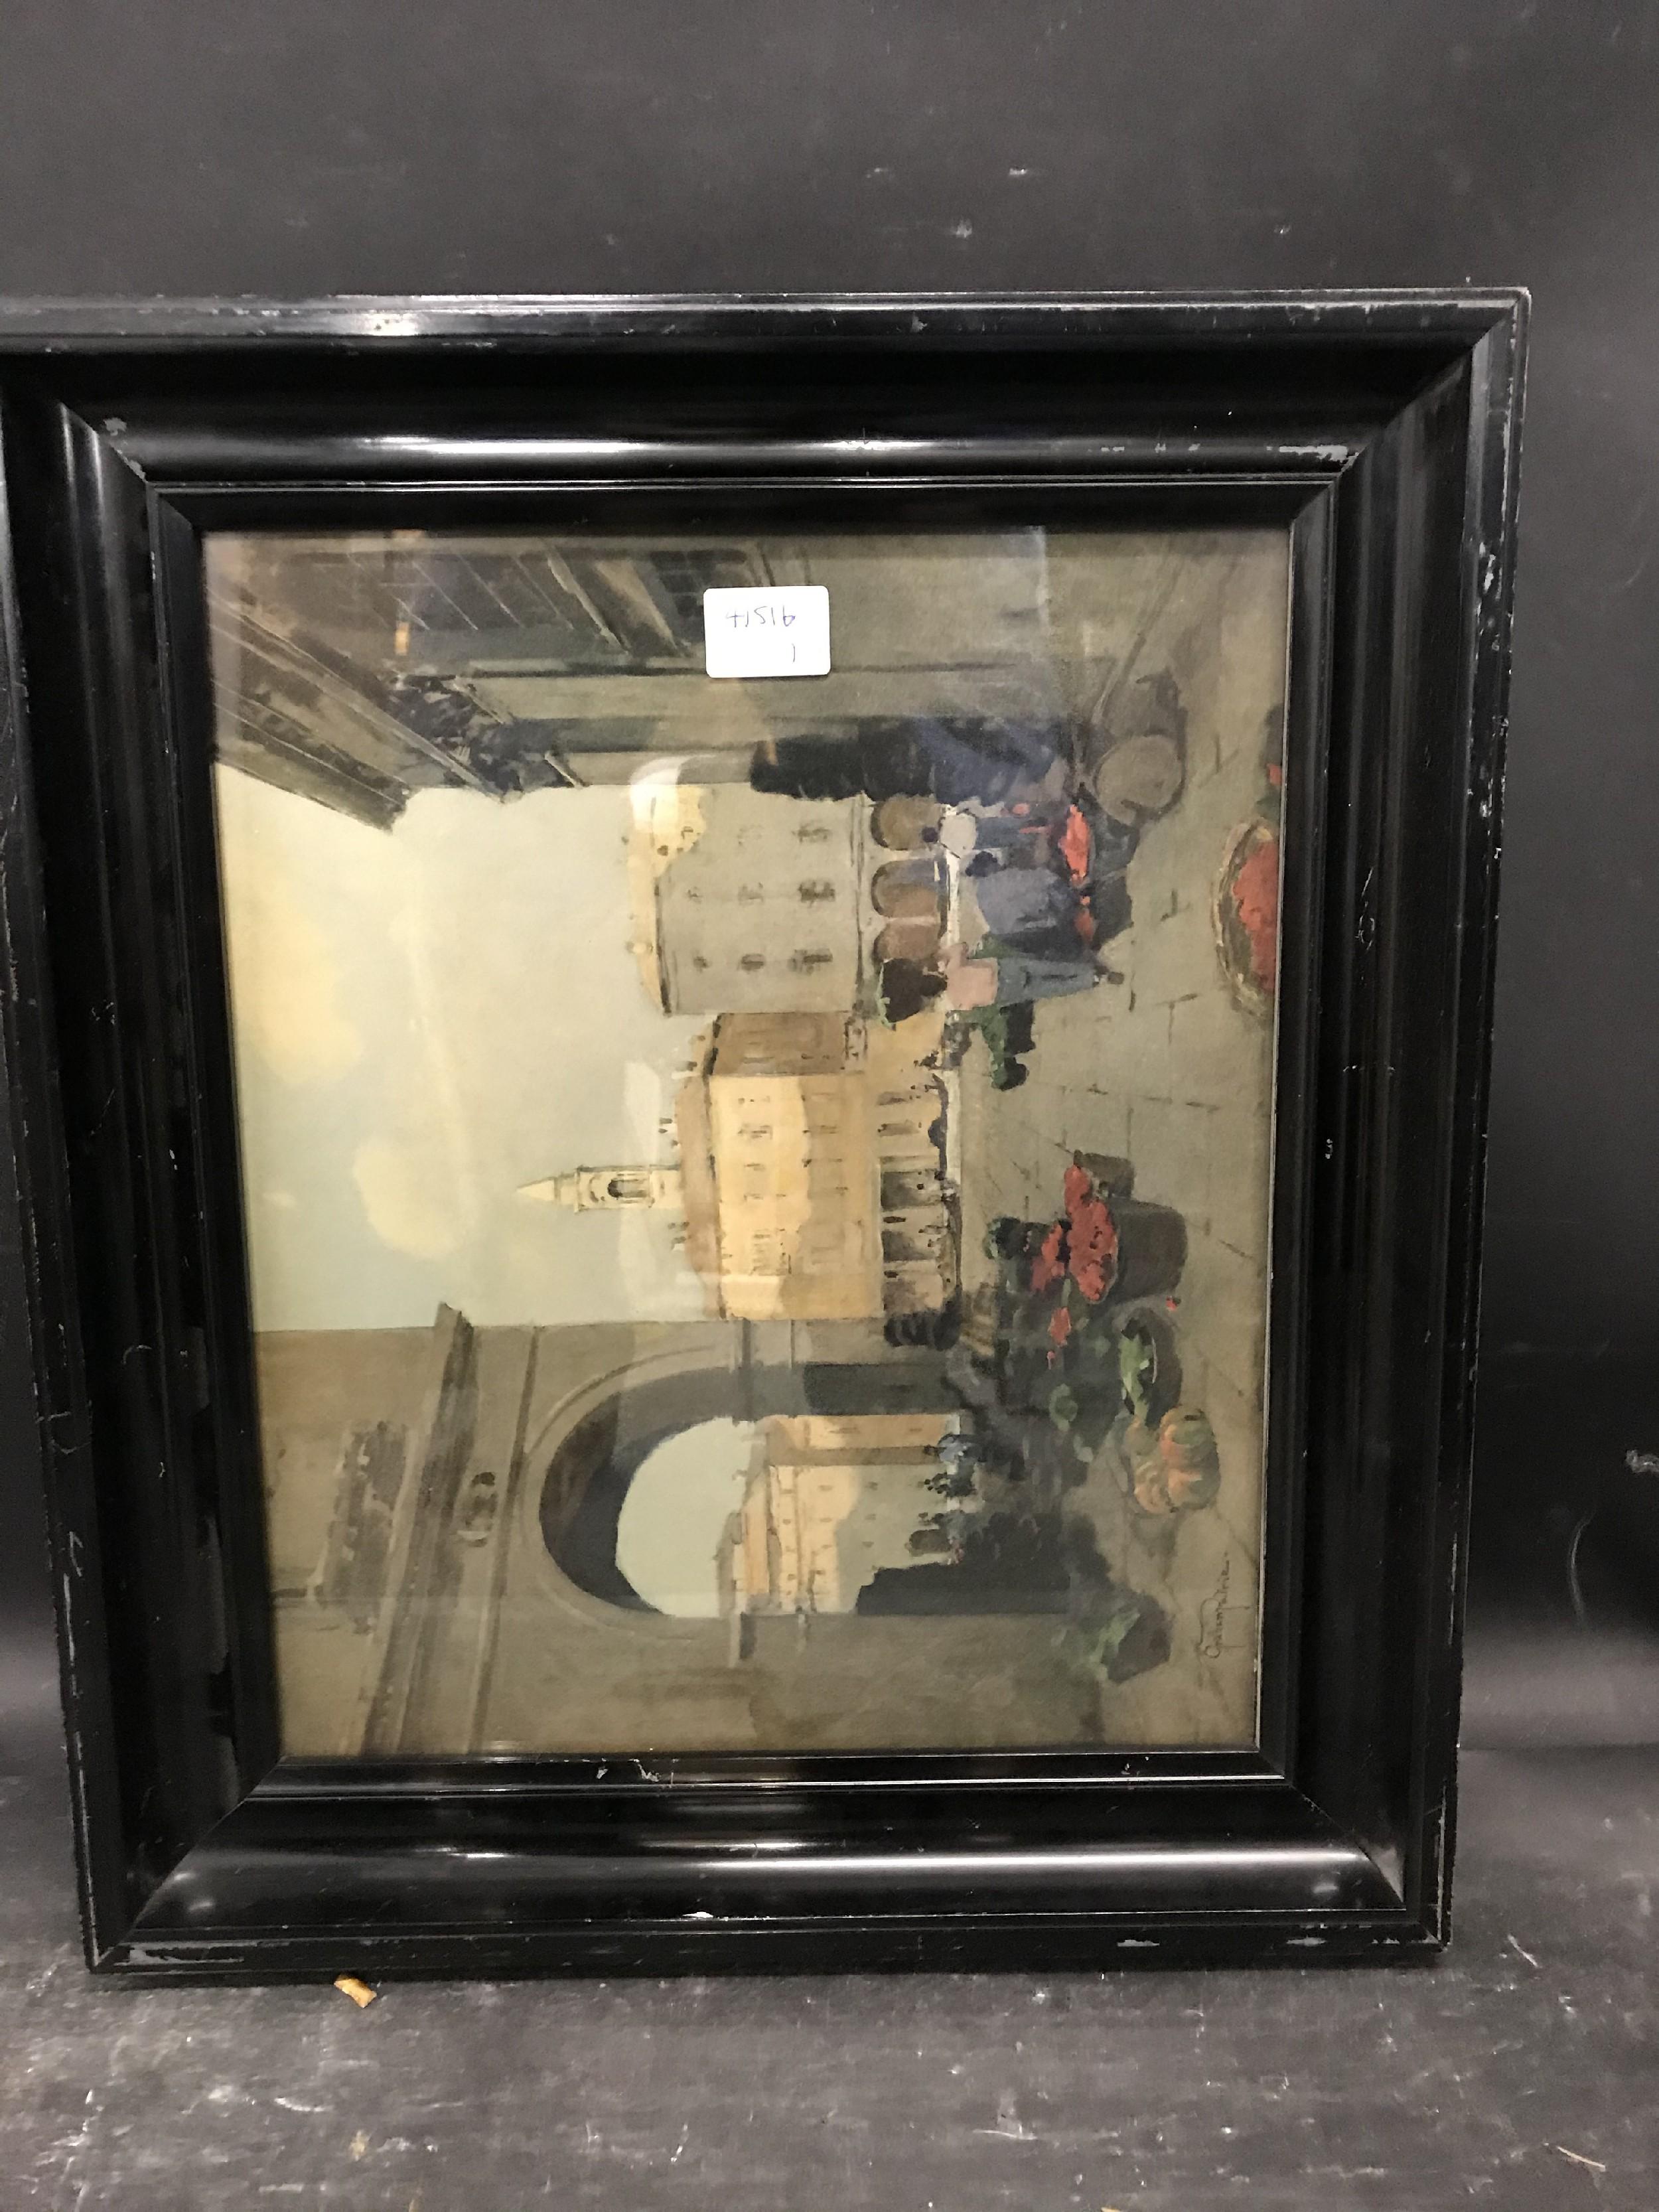 "Lot 58 - 20th Century English School. A Dutch Style Black Frame, with inset print, 13.75"" x 11.25"" (rebate)."